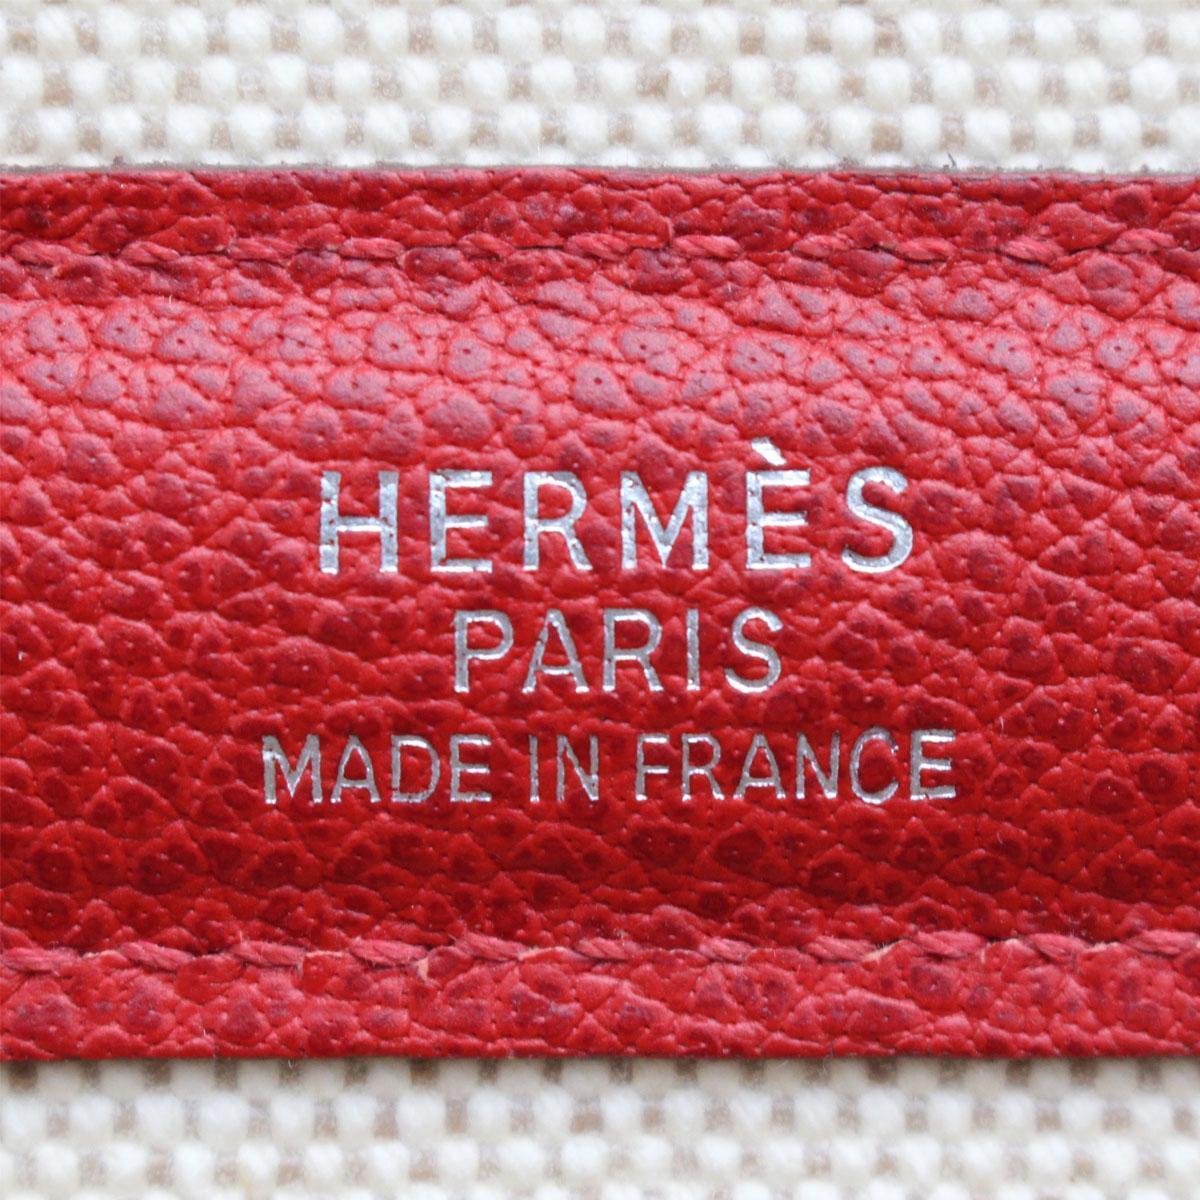 HERMES Paris Pet Dog Carrier Bag Case Sac De Transporte 5